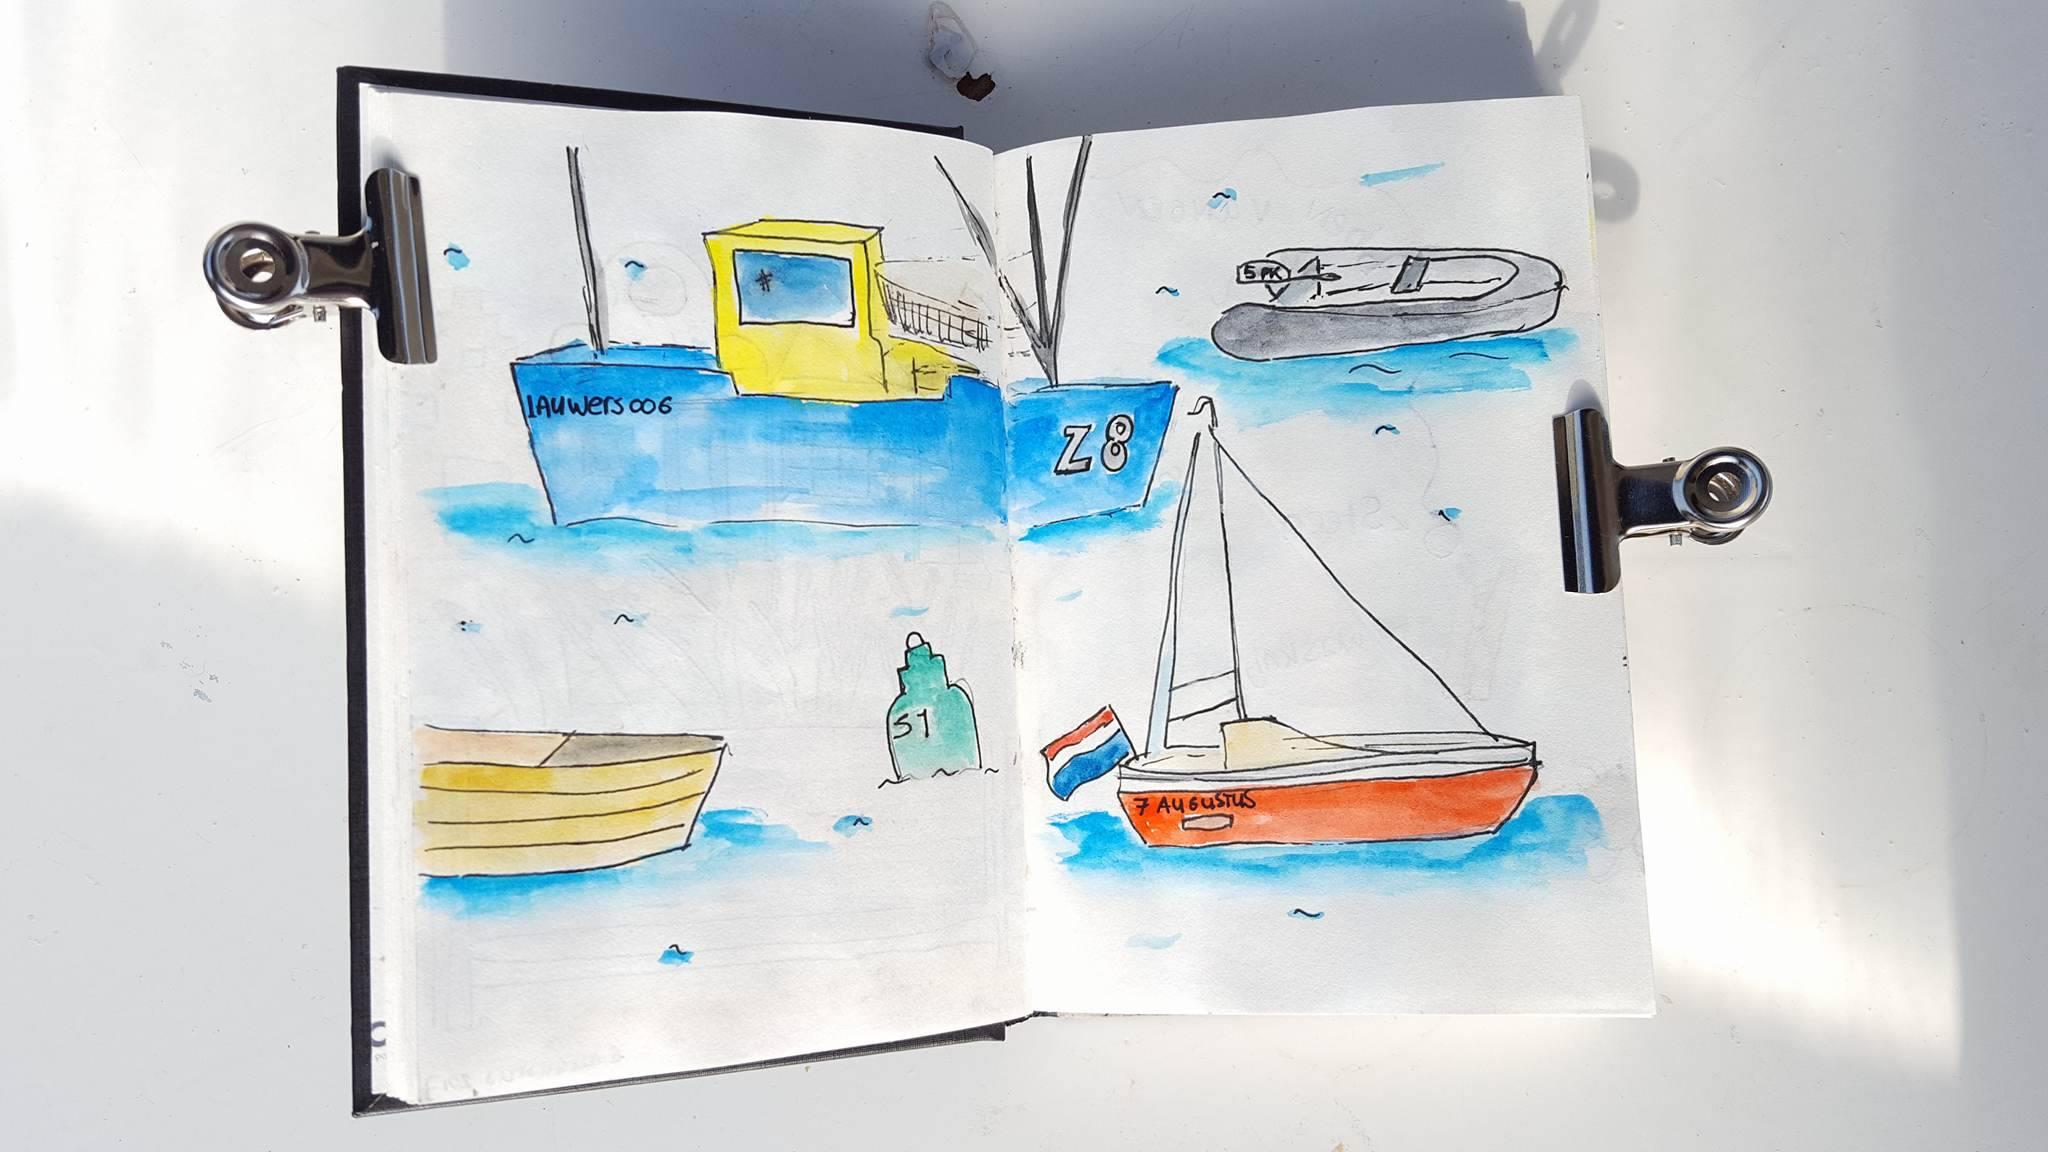 Liflotte dagboek Lauwersoog 2017